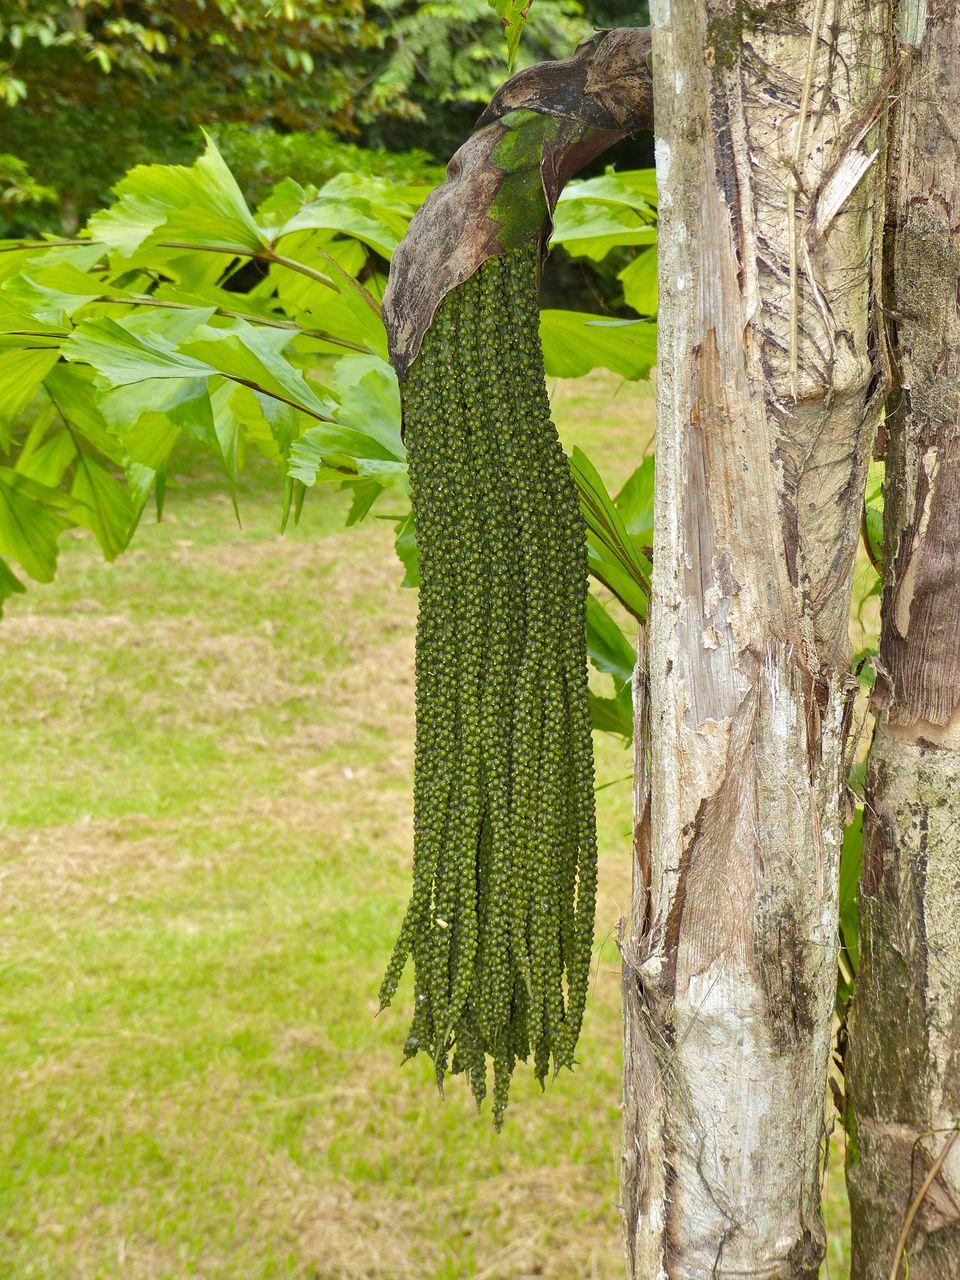 A closeup of a fishtail palm tree